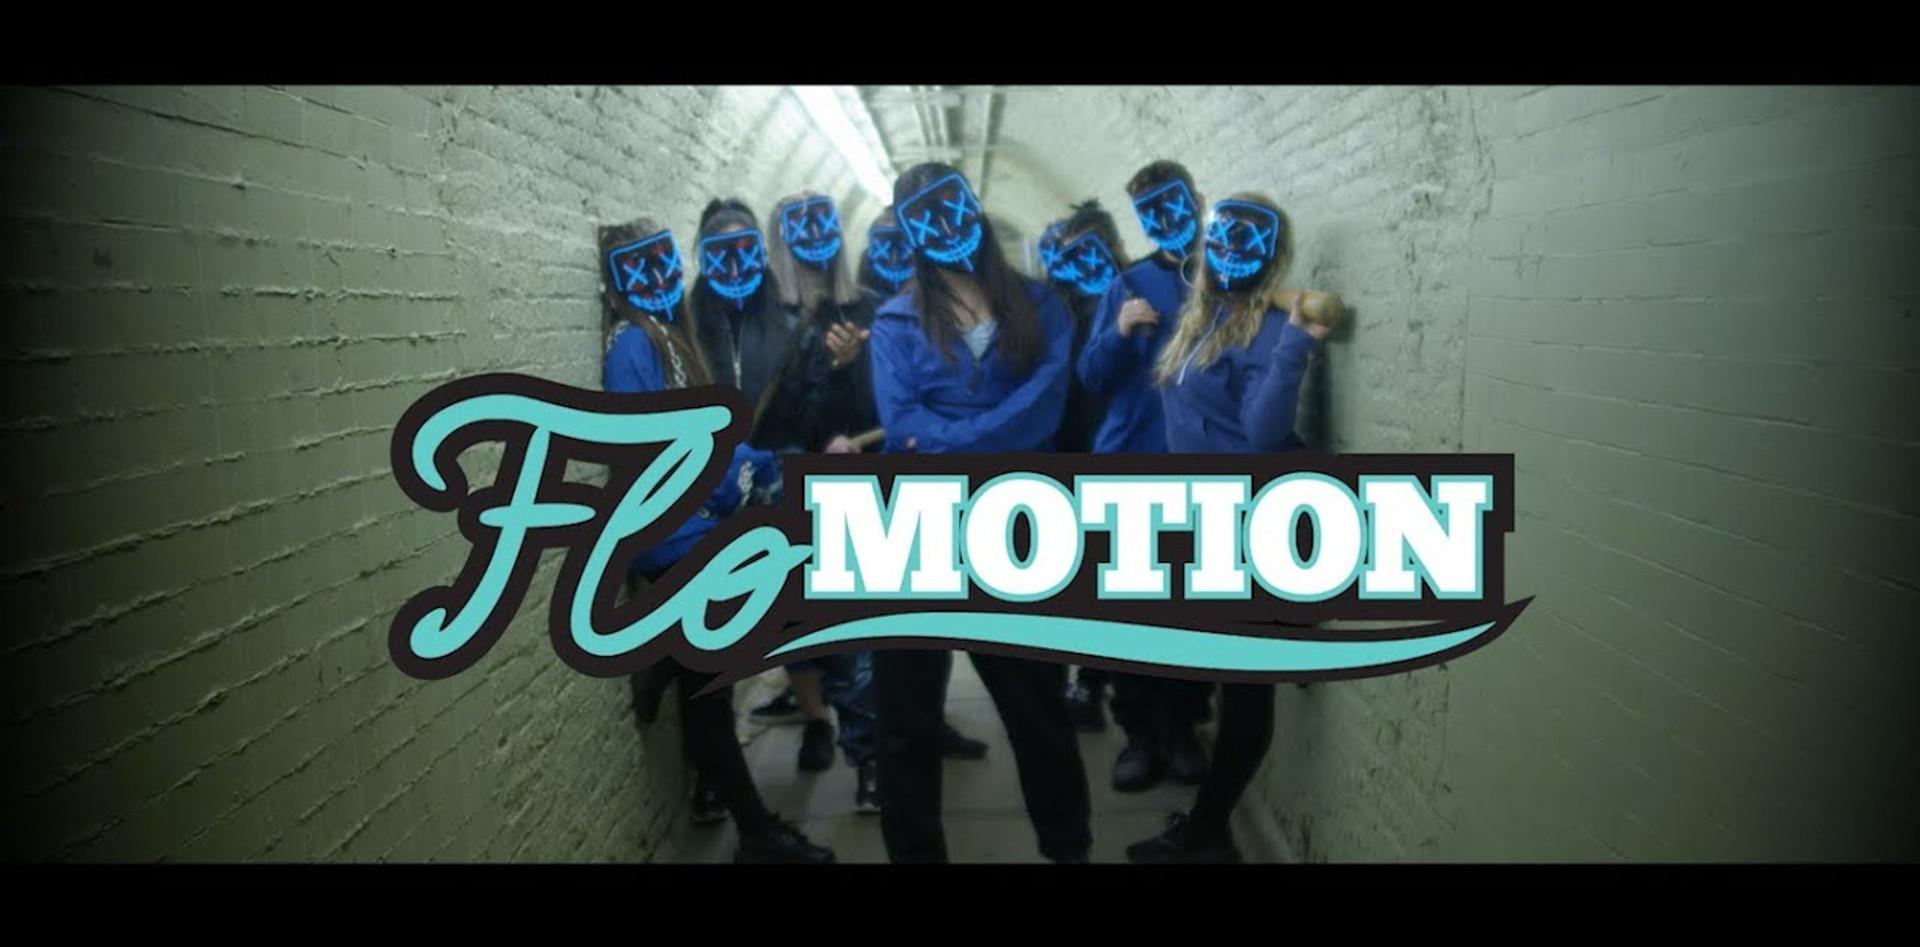 The Purge - FloMotion Dance Video